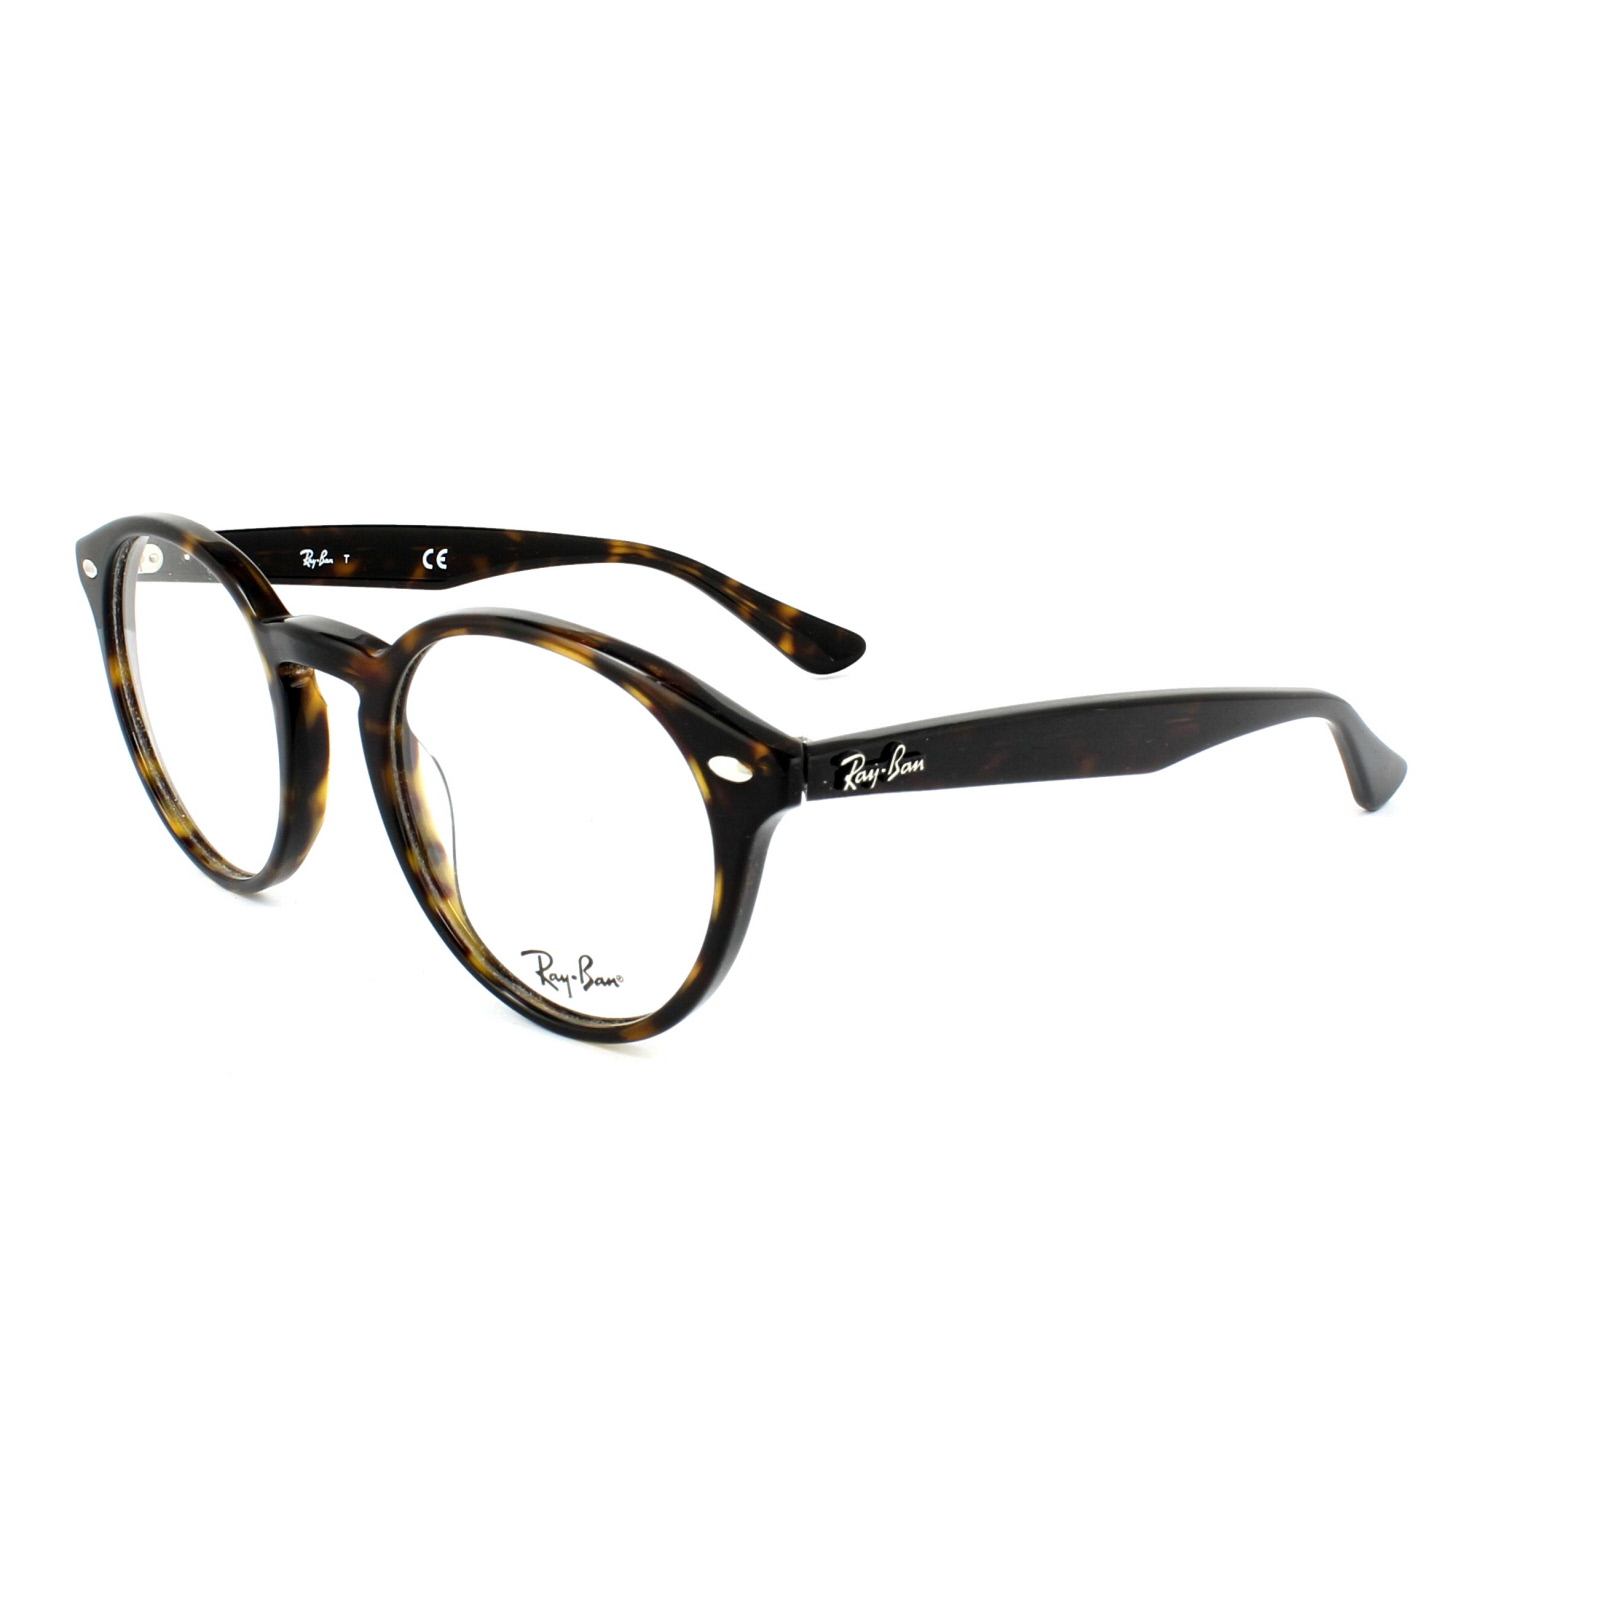 6ac2dea24476 Ray-Ban Glasses Frames 2180V 2012 Dark Havana 8053672356878